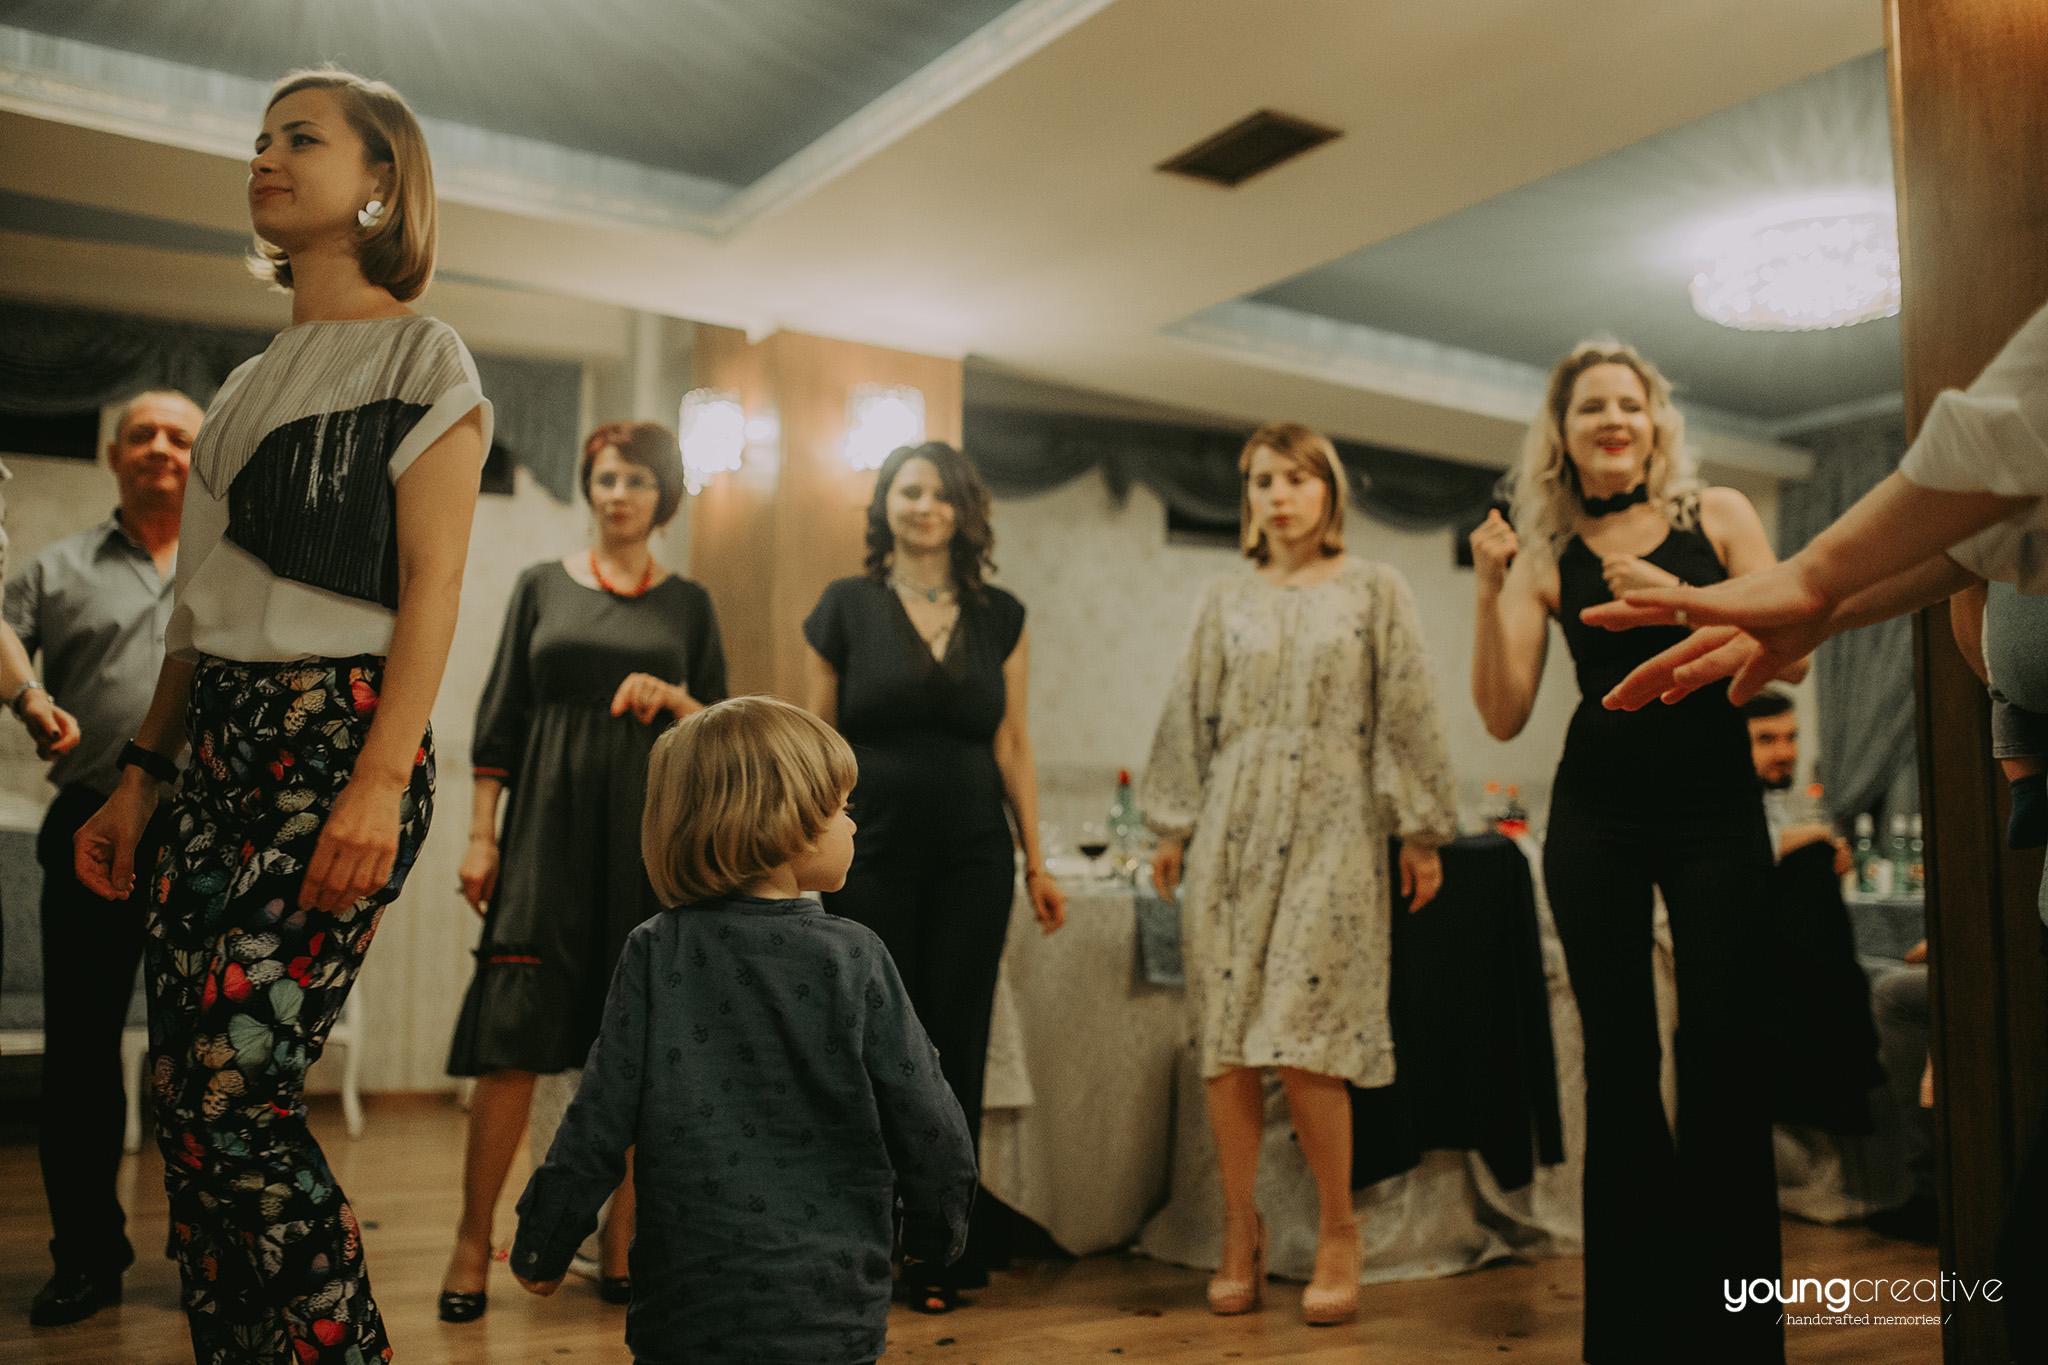 Botez Dragos | youngcreative.info media | Dan Filipciuc, Cristina Bejan | fotografie de botez Suceava